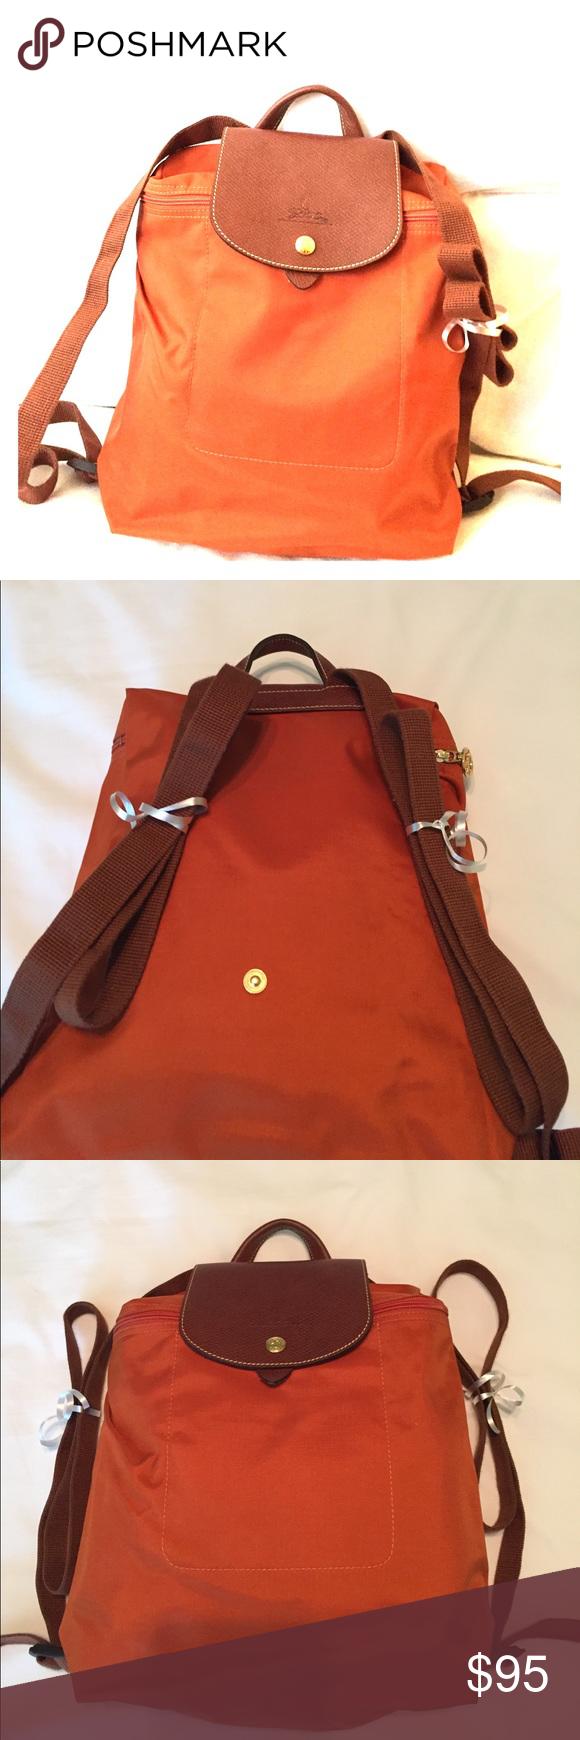 d15de887a8b1 Longchamp backpack orange and brown Longchamp backpack. Orang with brown  leather and straps. Inside pocket. White interior interior.